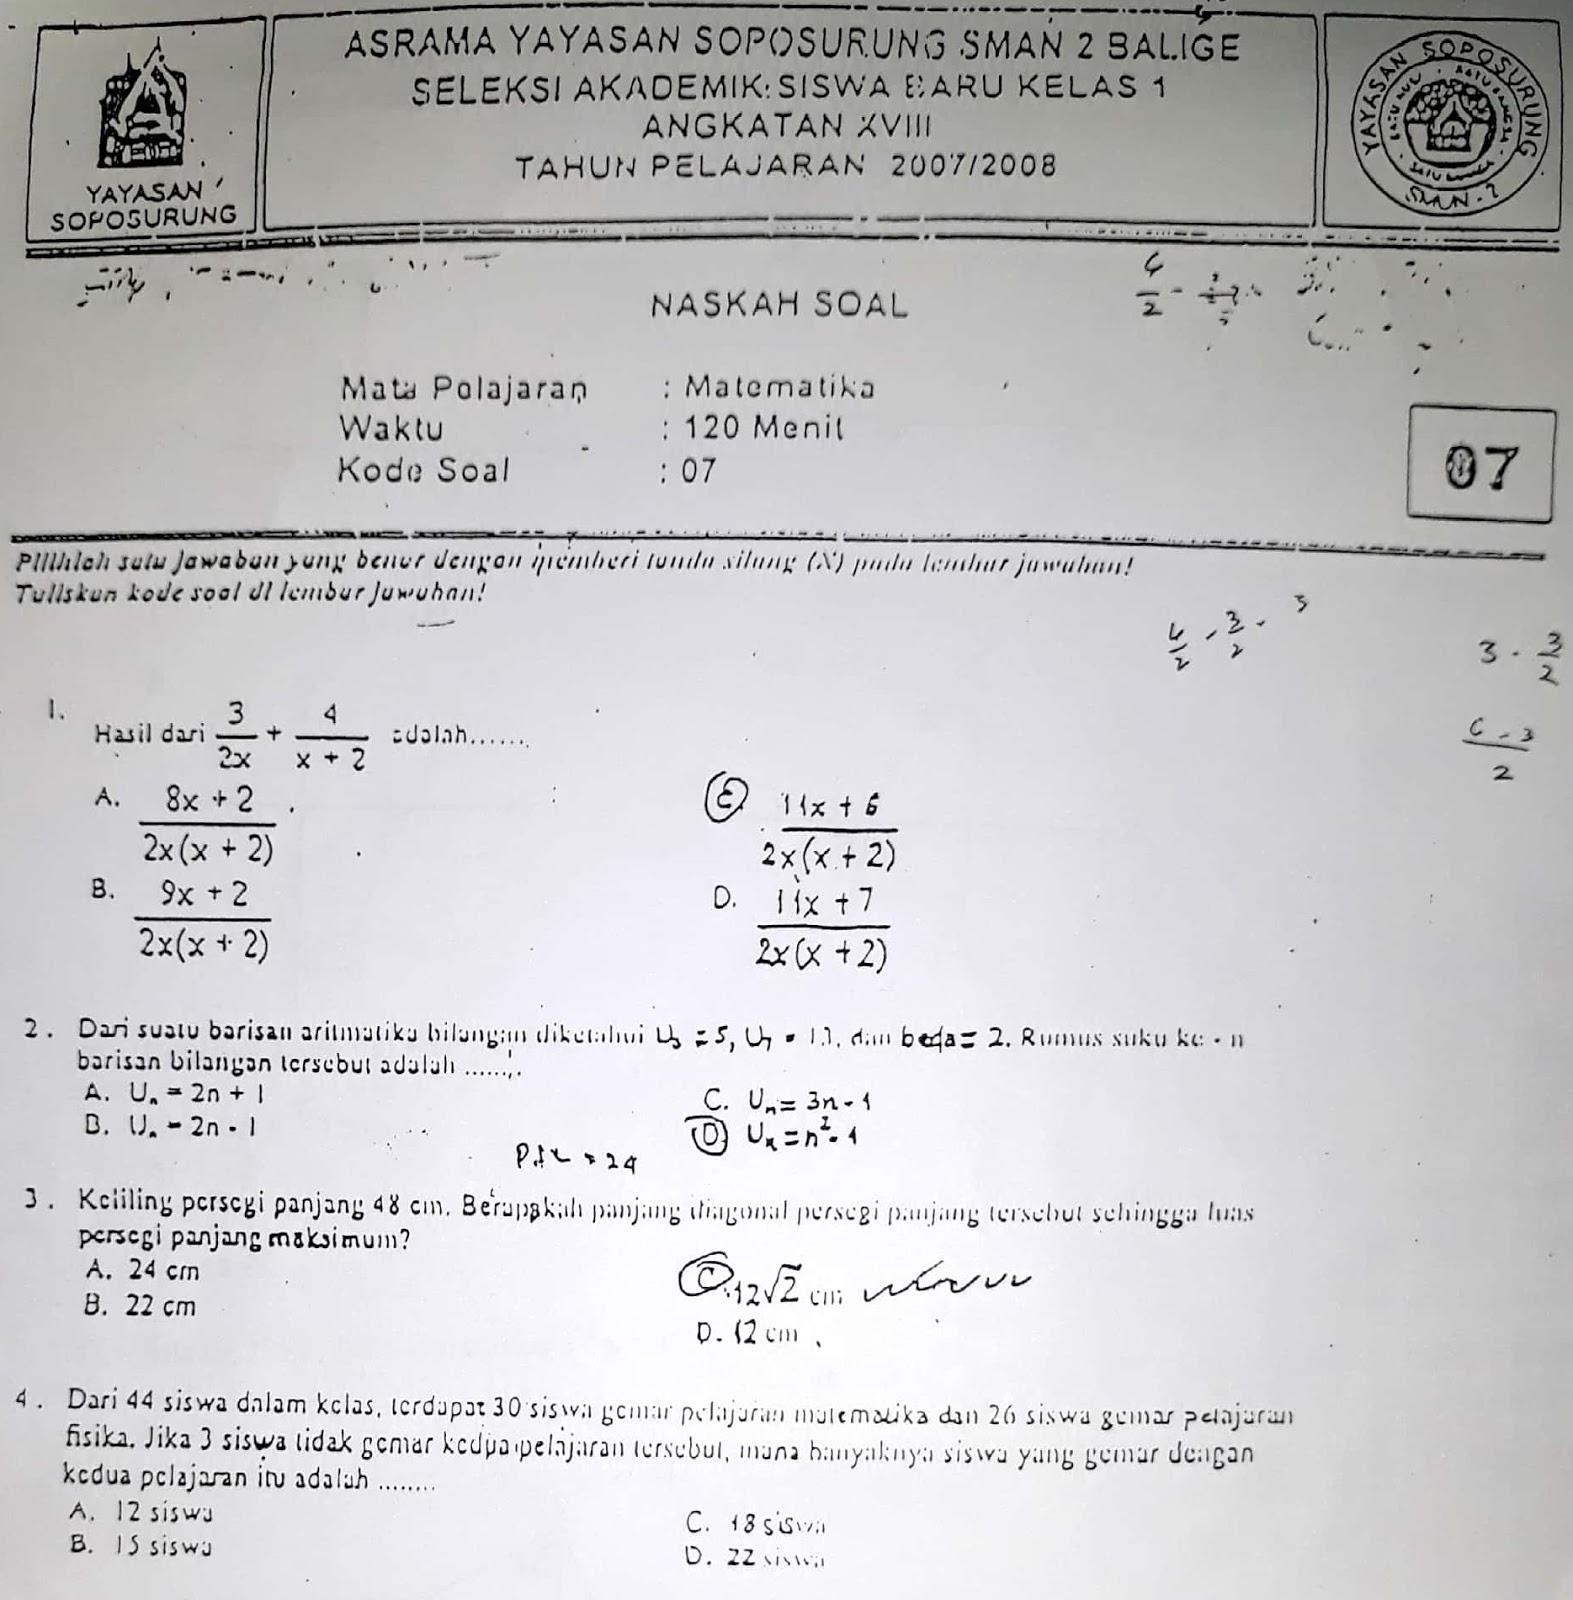 Matematika SMP, Seleksi Akademik Masuk Asrama YASOP SMAN 2 Balige 2007